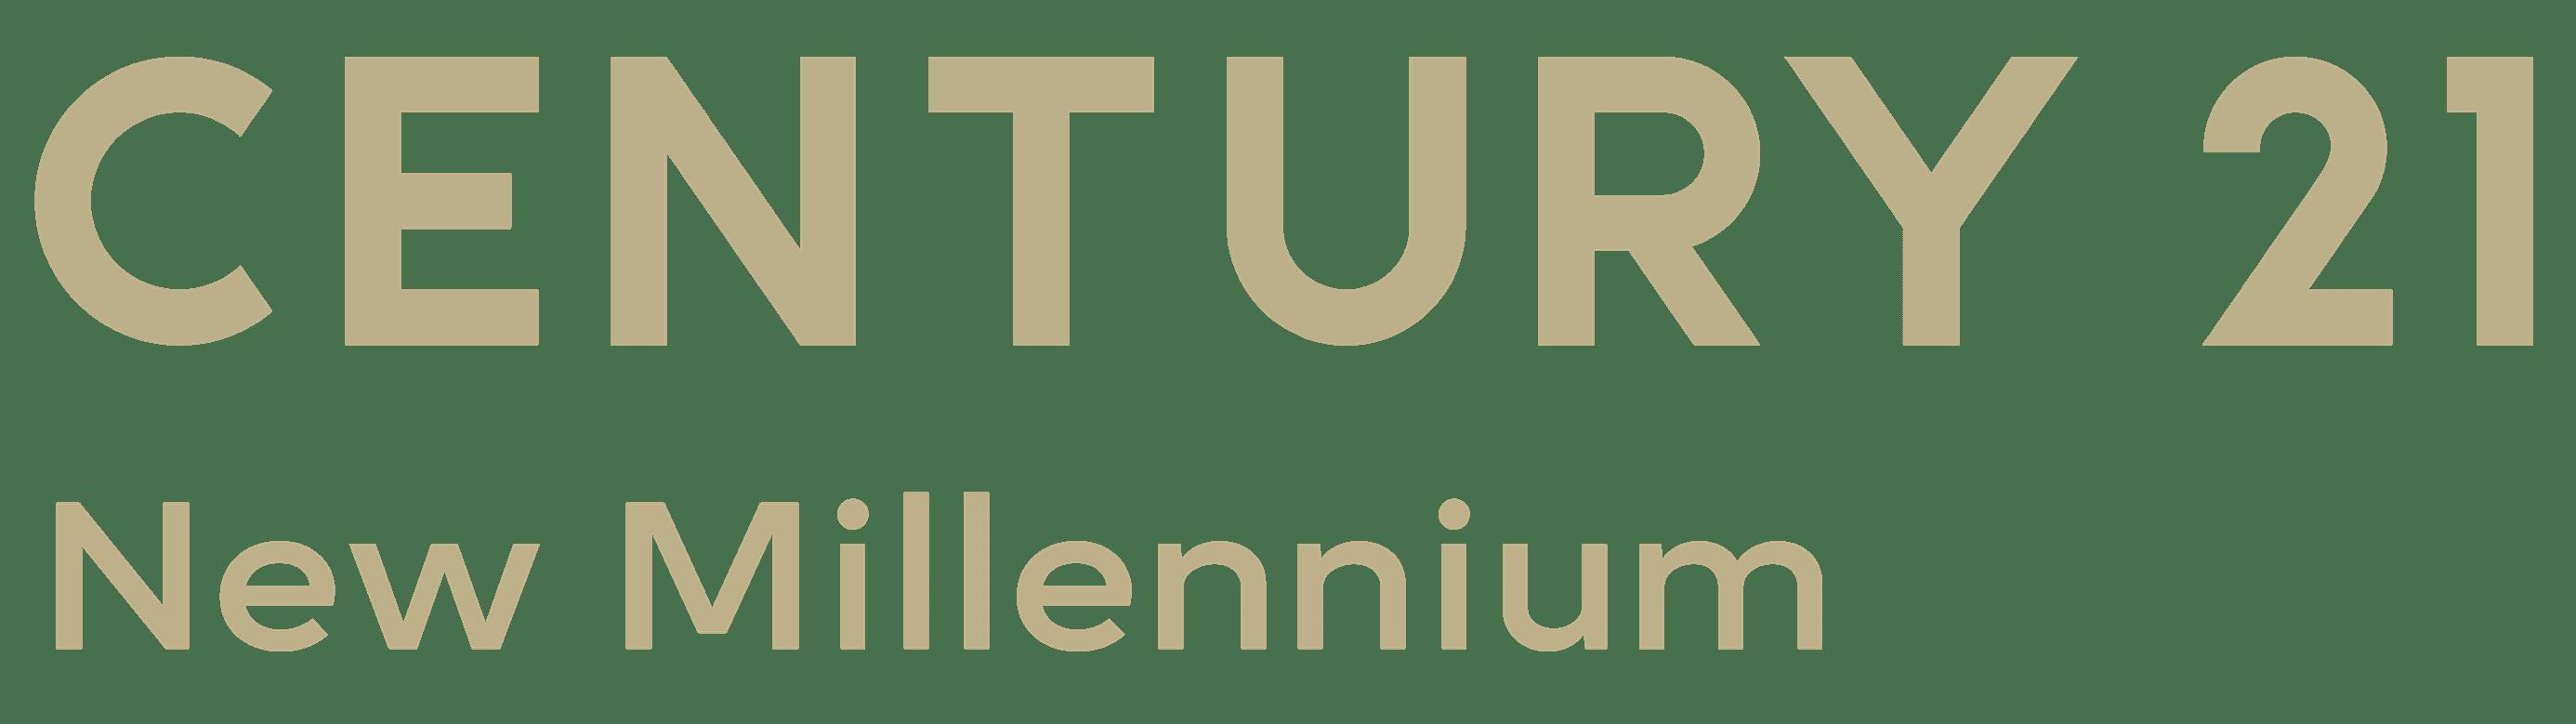 Century21 New Millennium Logo